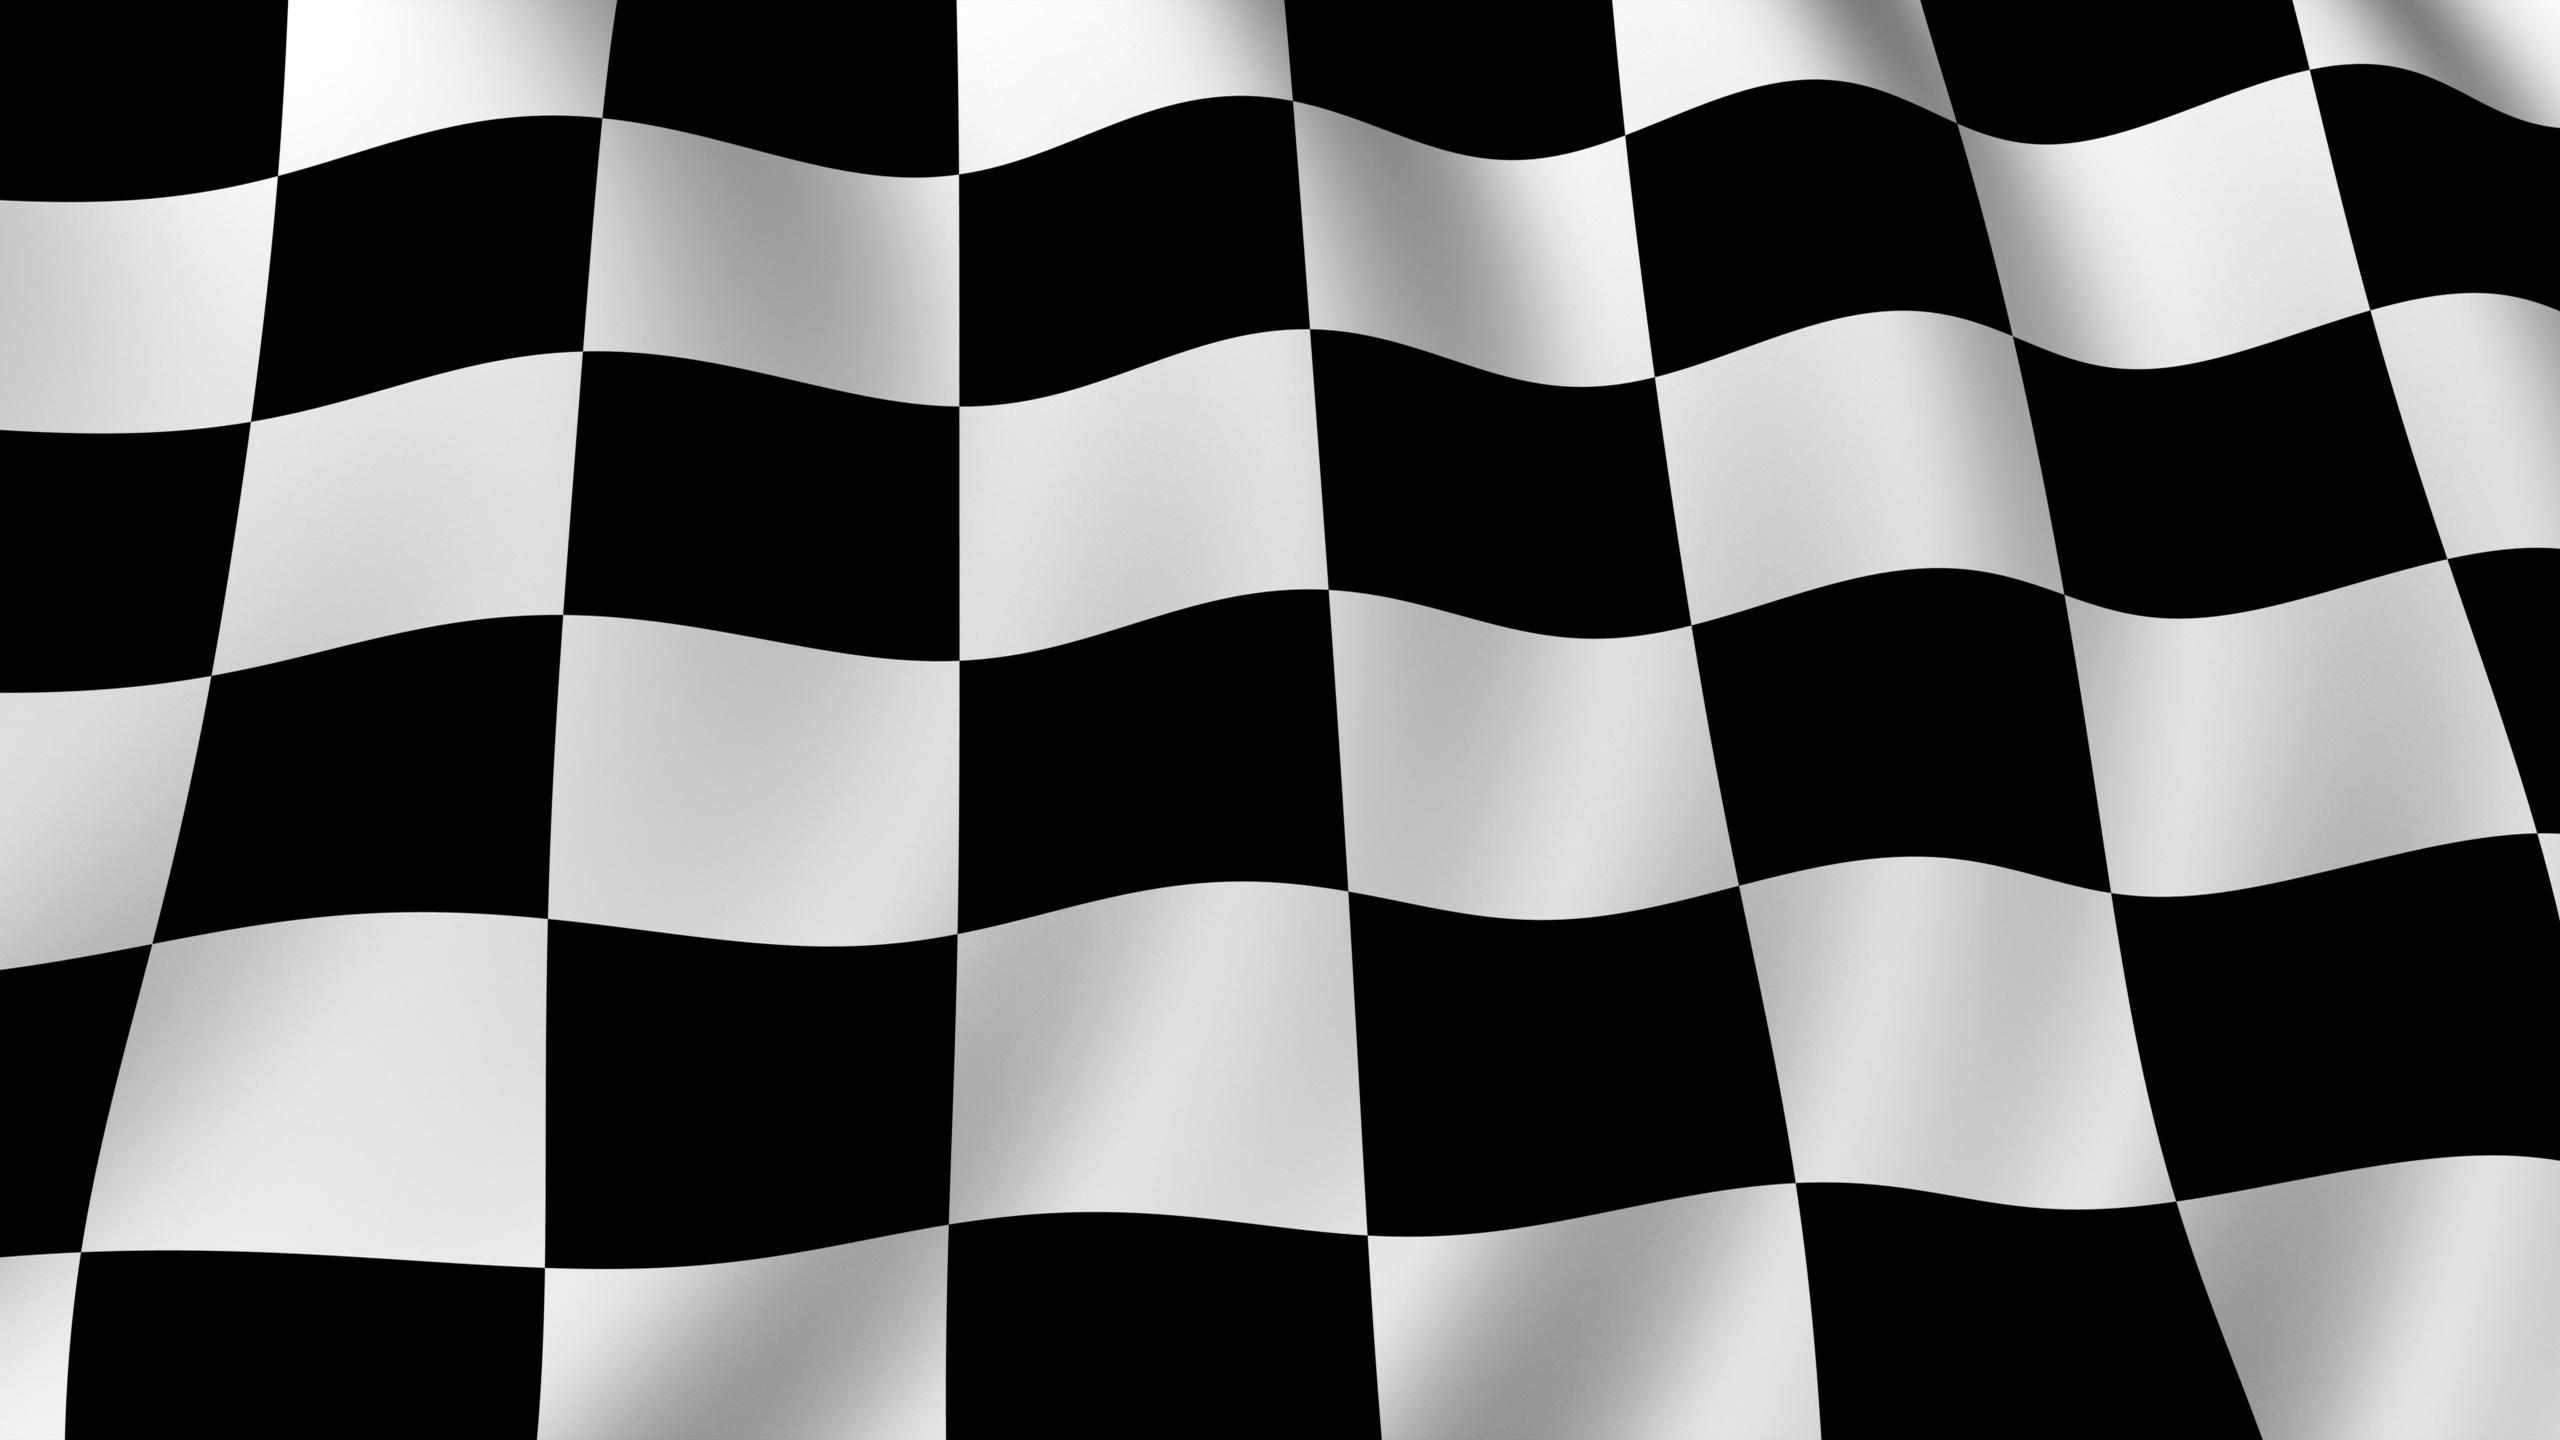 Checkered Flag Wallpaper 47326 2560x1440px 2560x1440